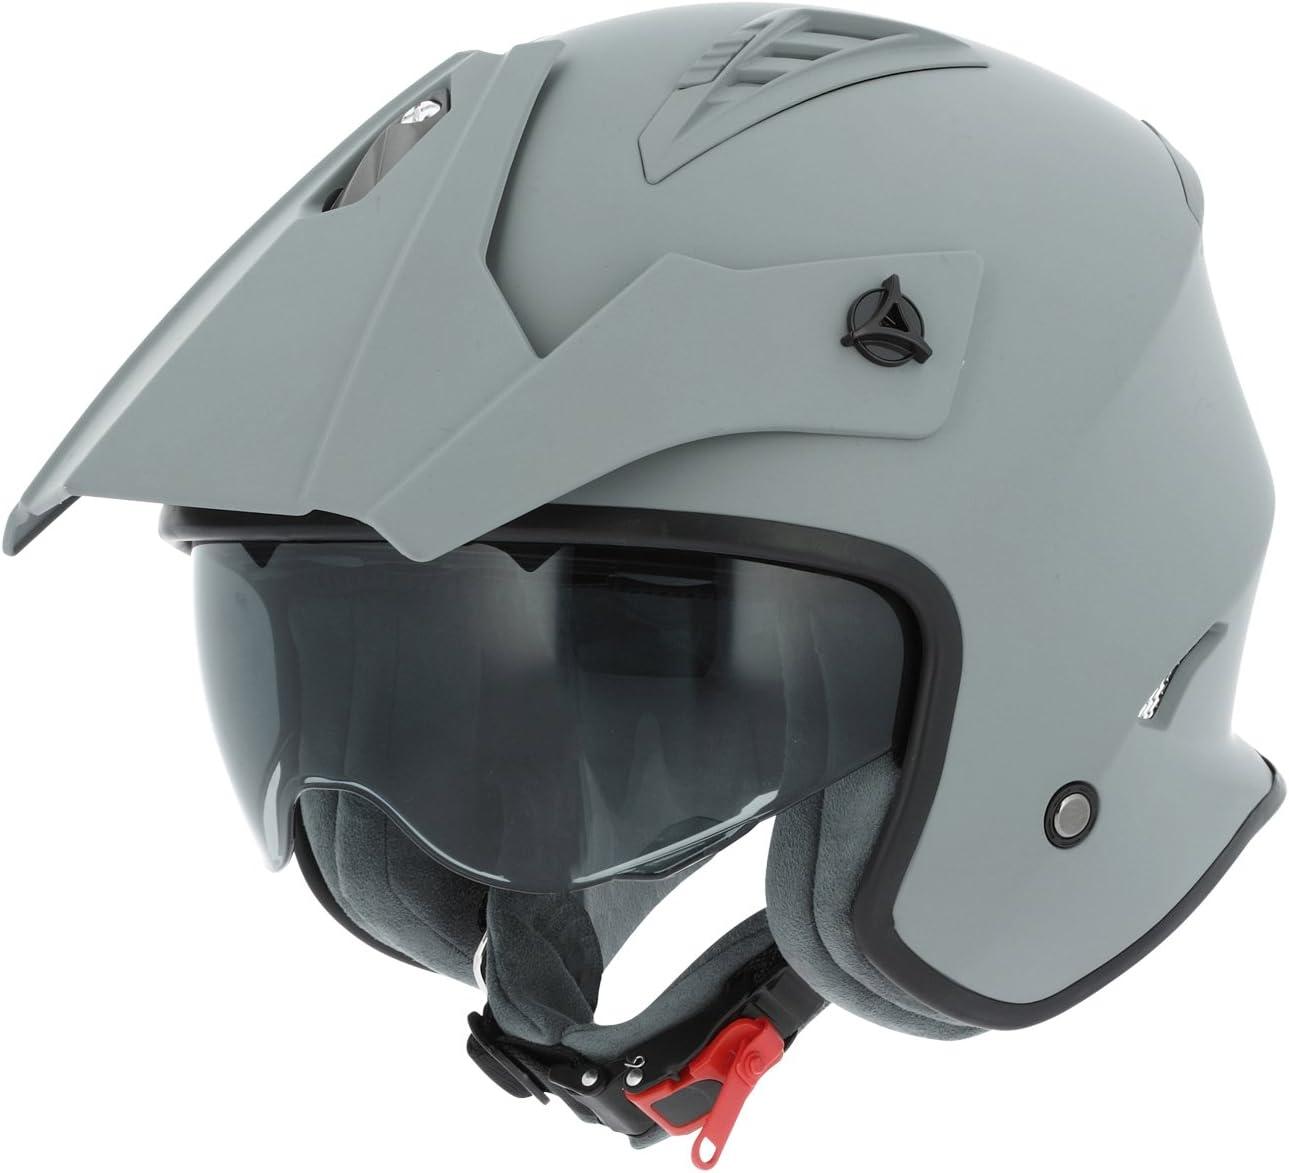 Mejor casco Scorpion modular